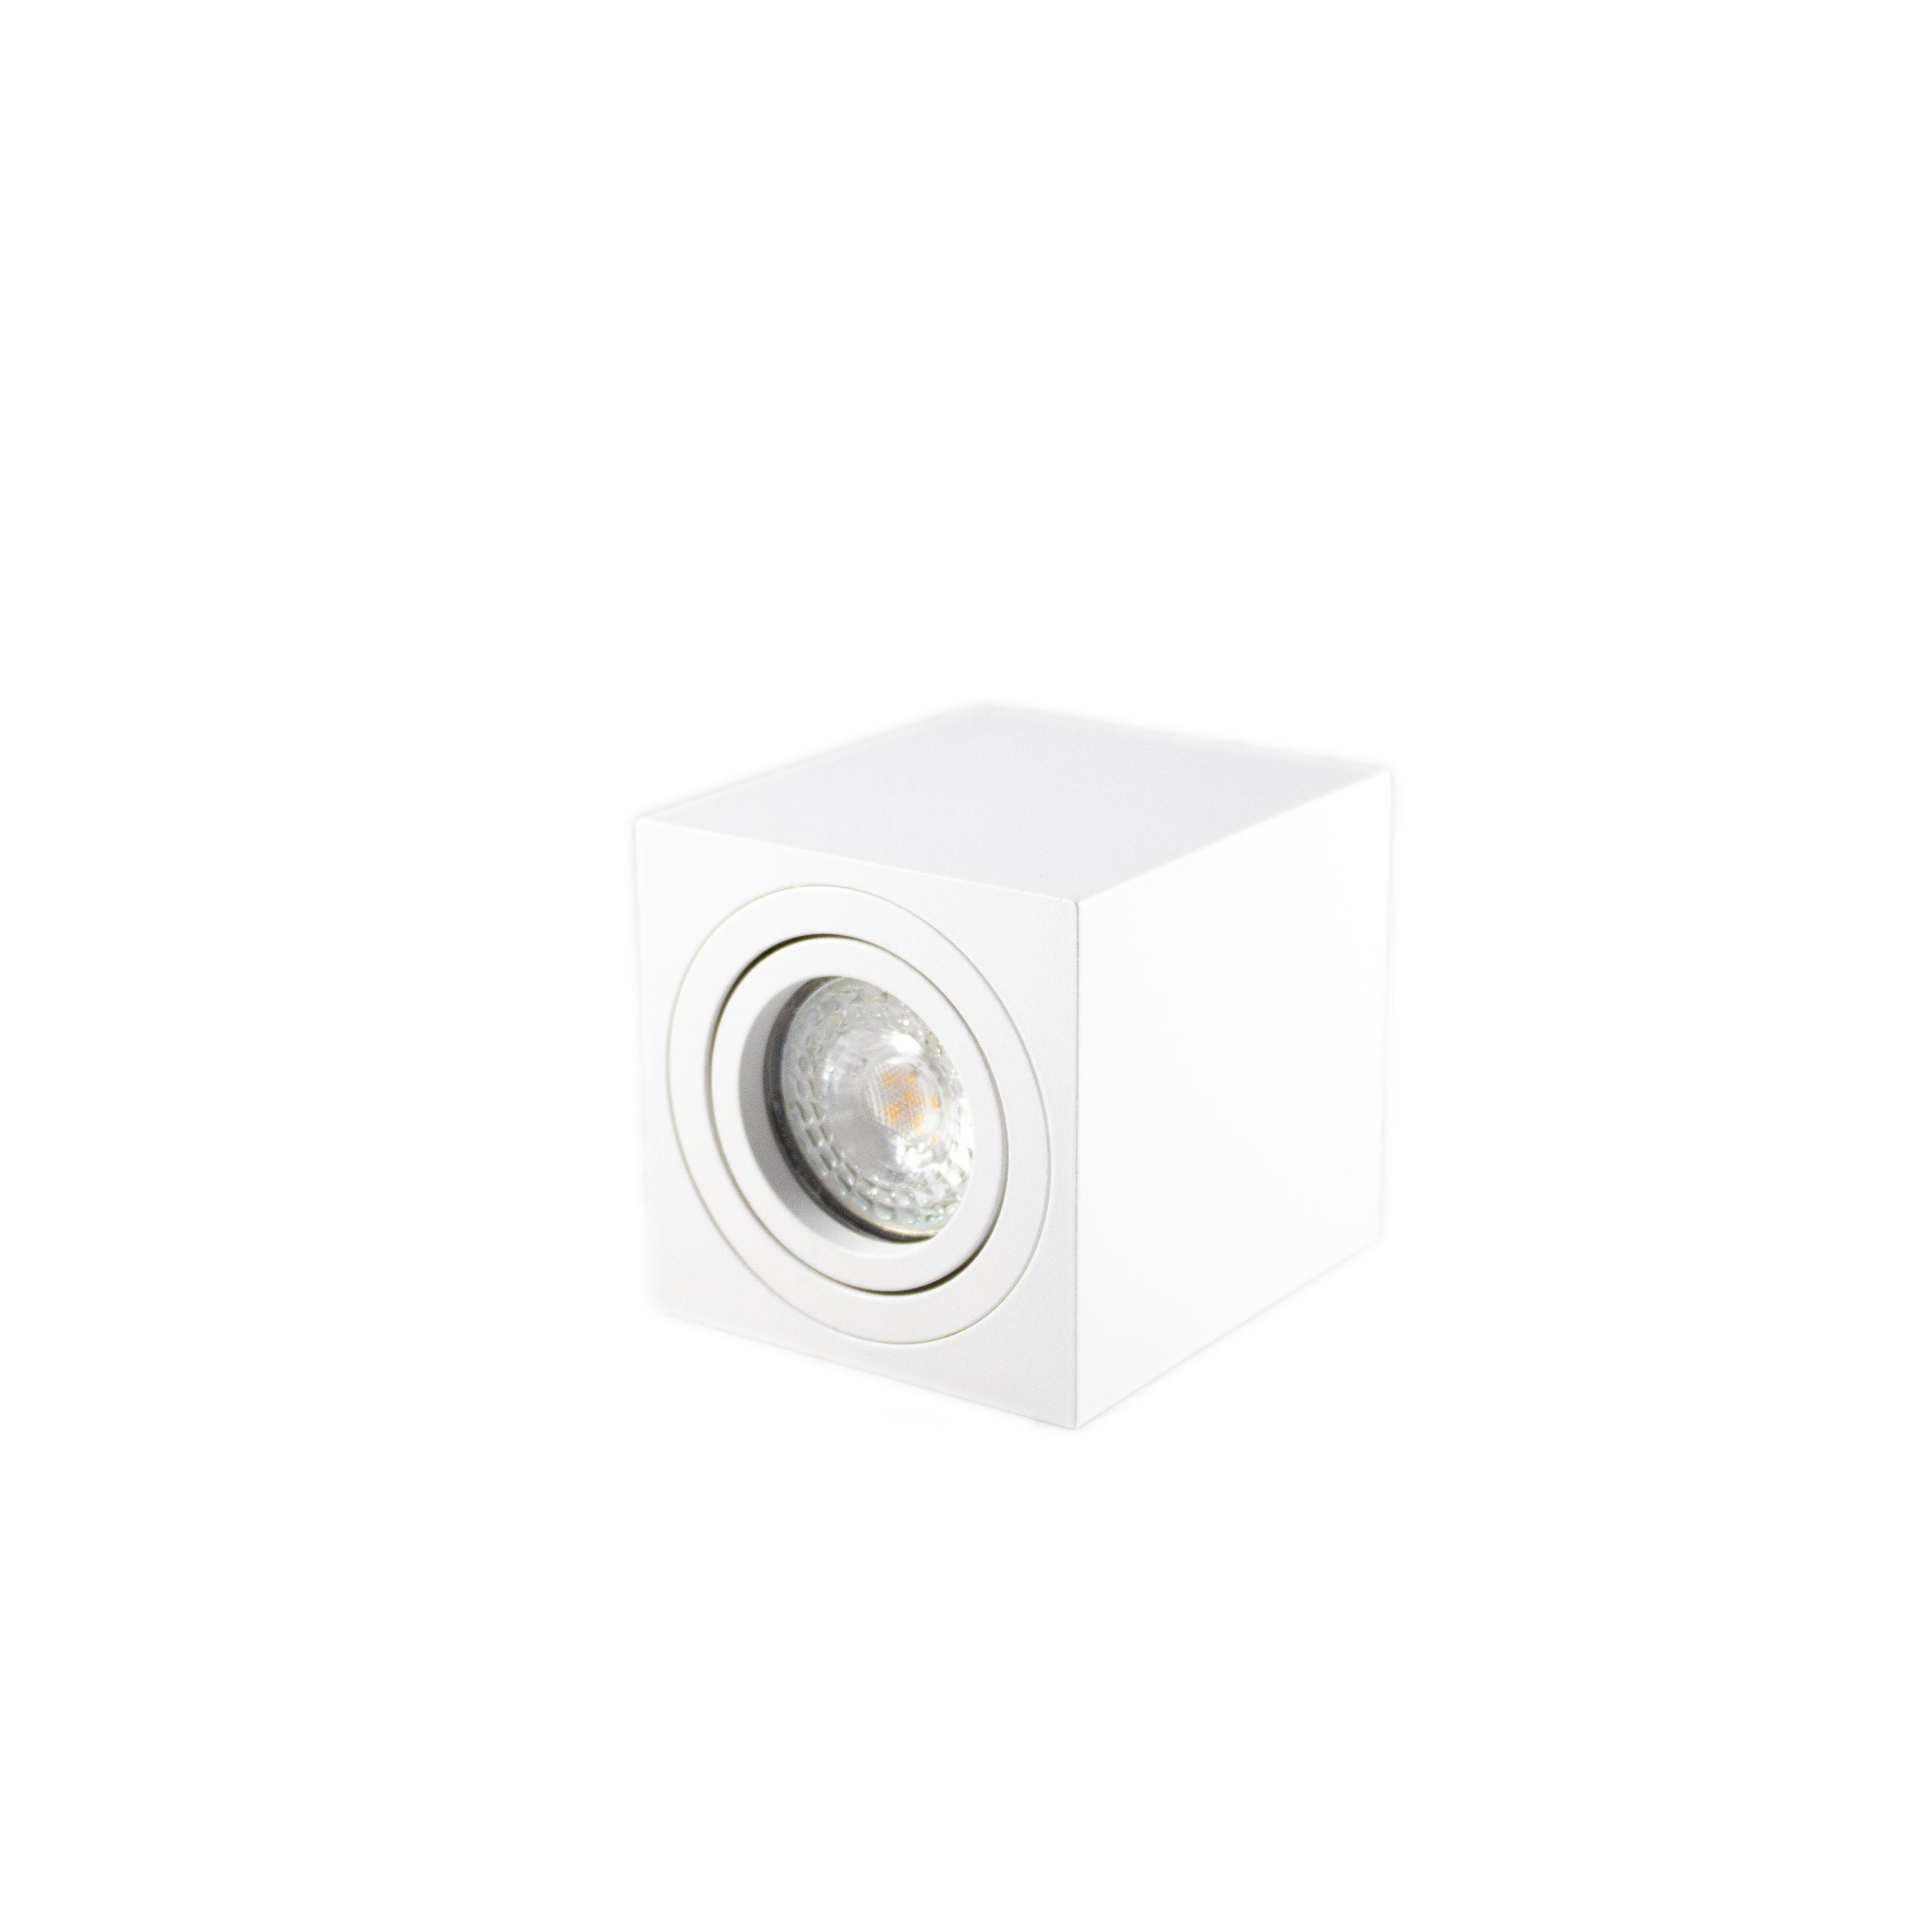 Opbouw spot armatuur wit vierkant kantelbaar GU10 fitting - liggend met spot